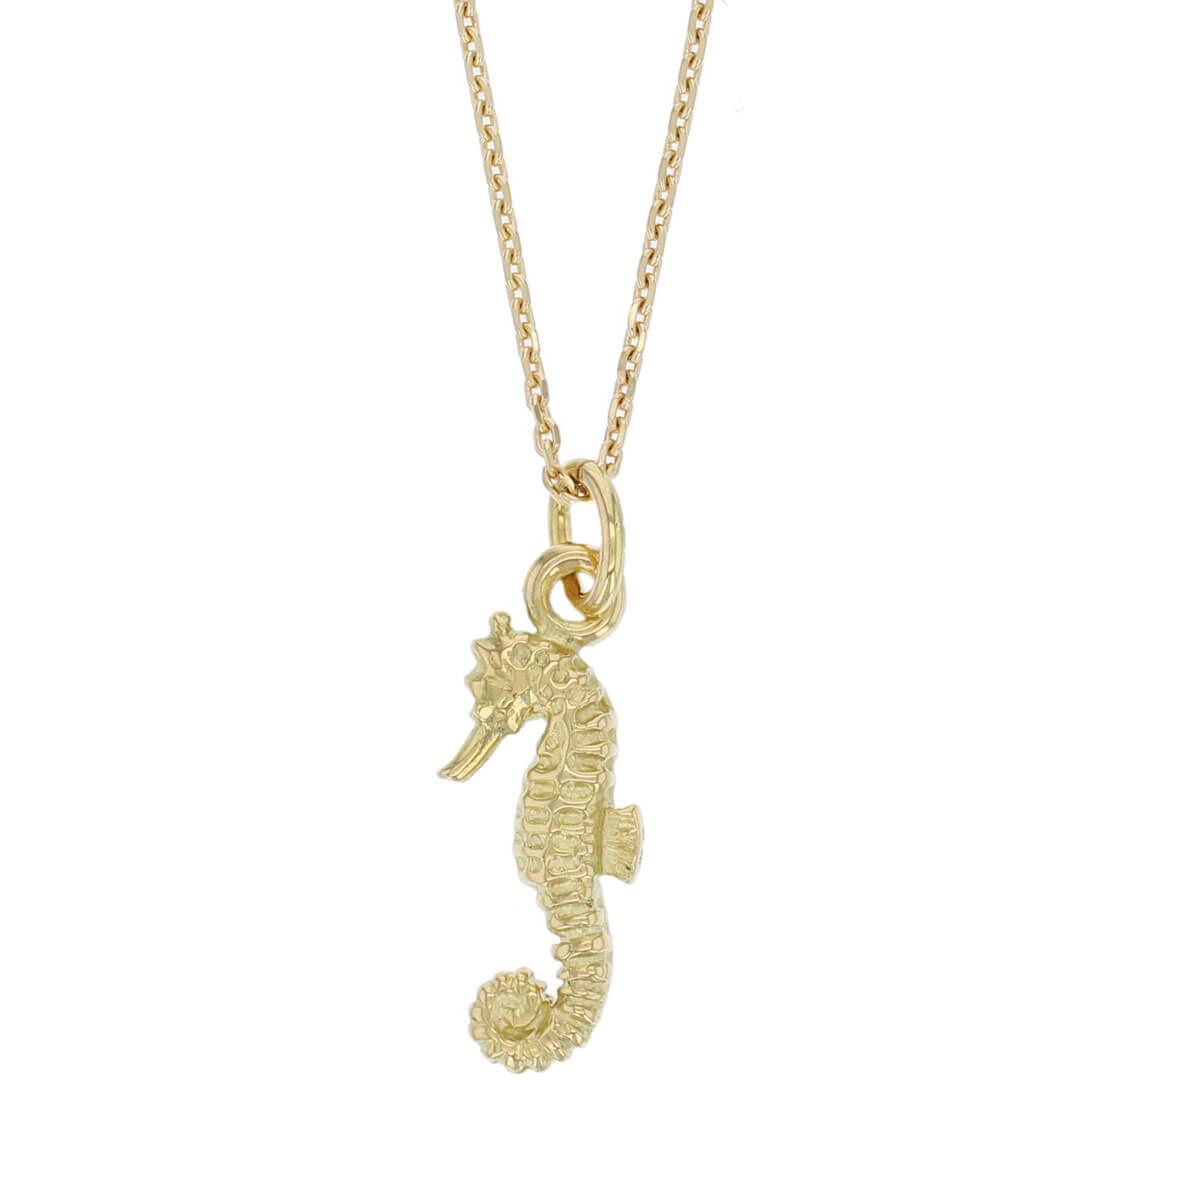 18ct yellow gold seahorse pendant, charm, Brian Boru's harp, Trinity college, Dublin medieval, Gaelic, Irish charm, Ireland, designer handmade by Faller, hand crafted sea creature